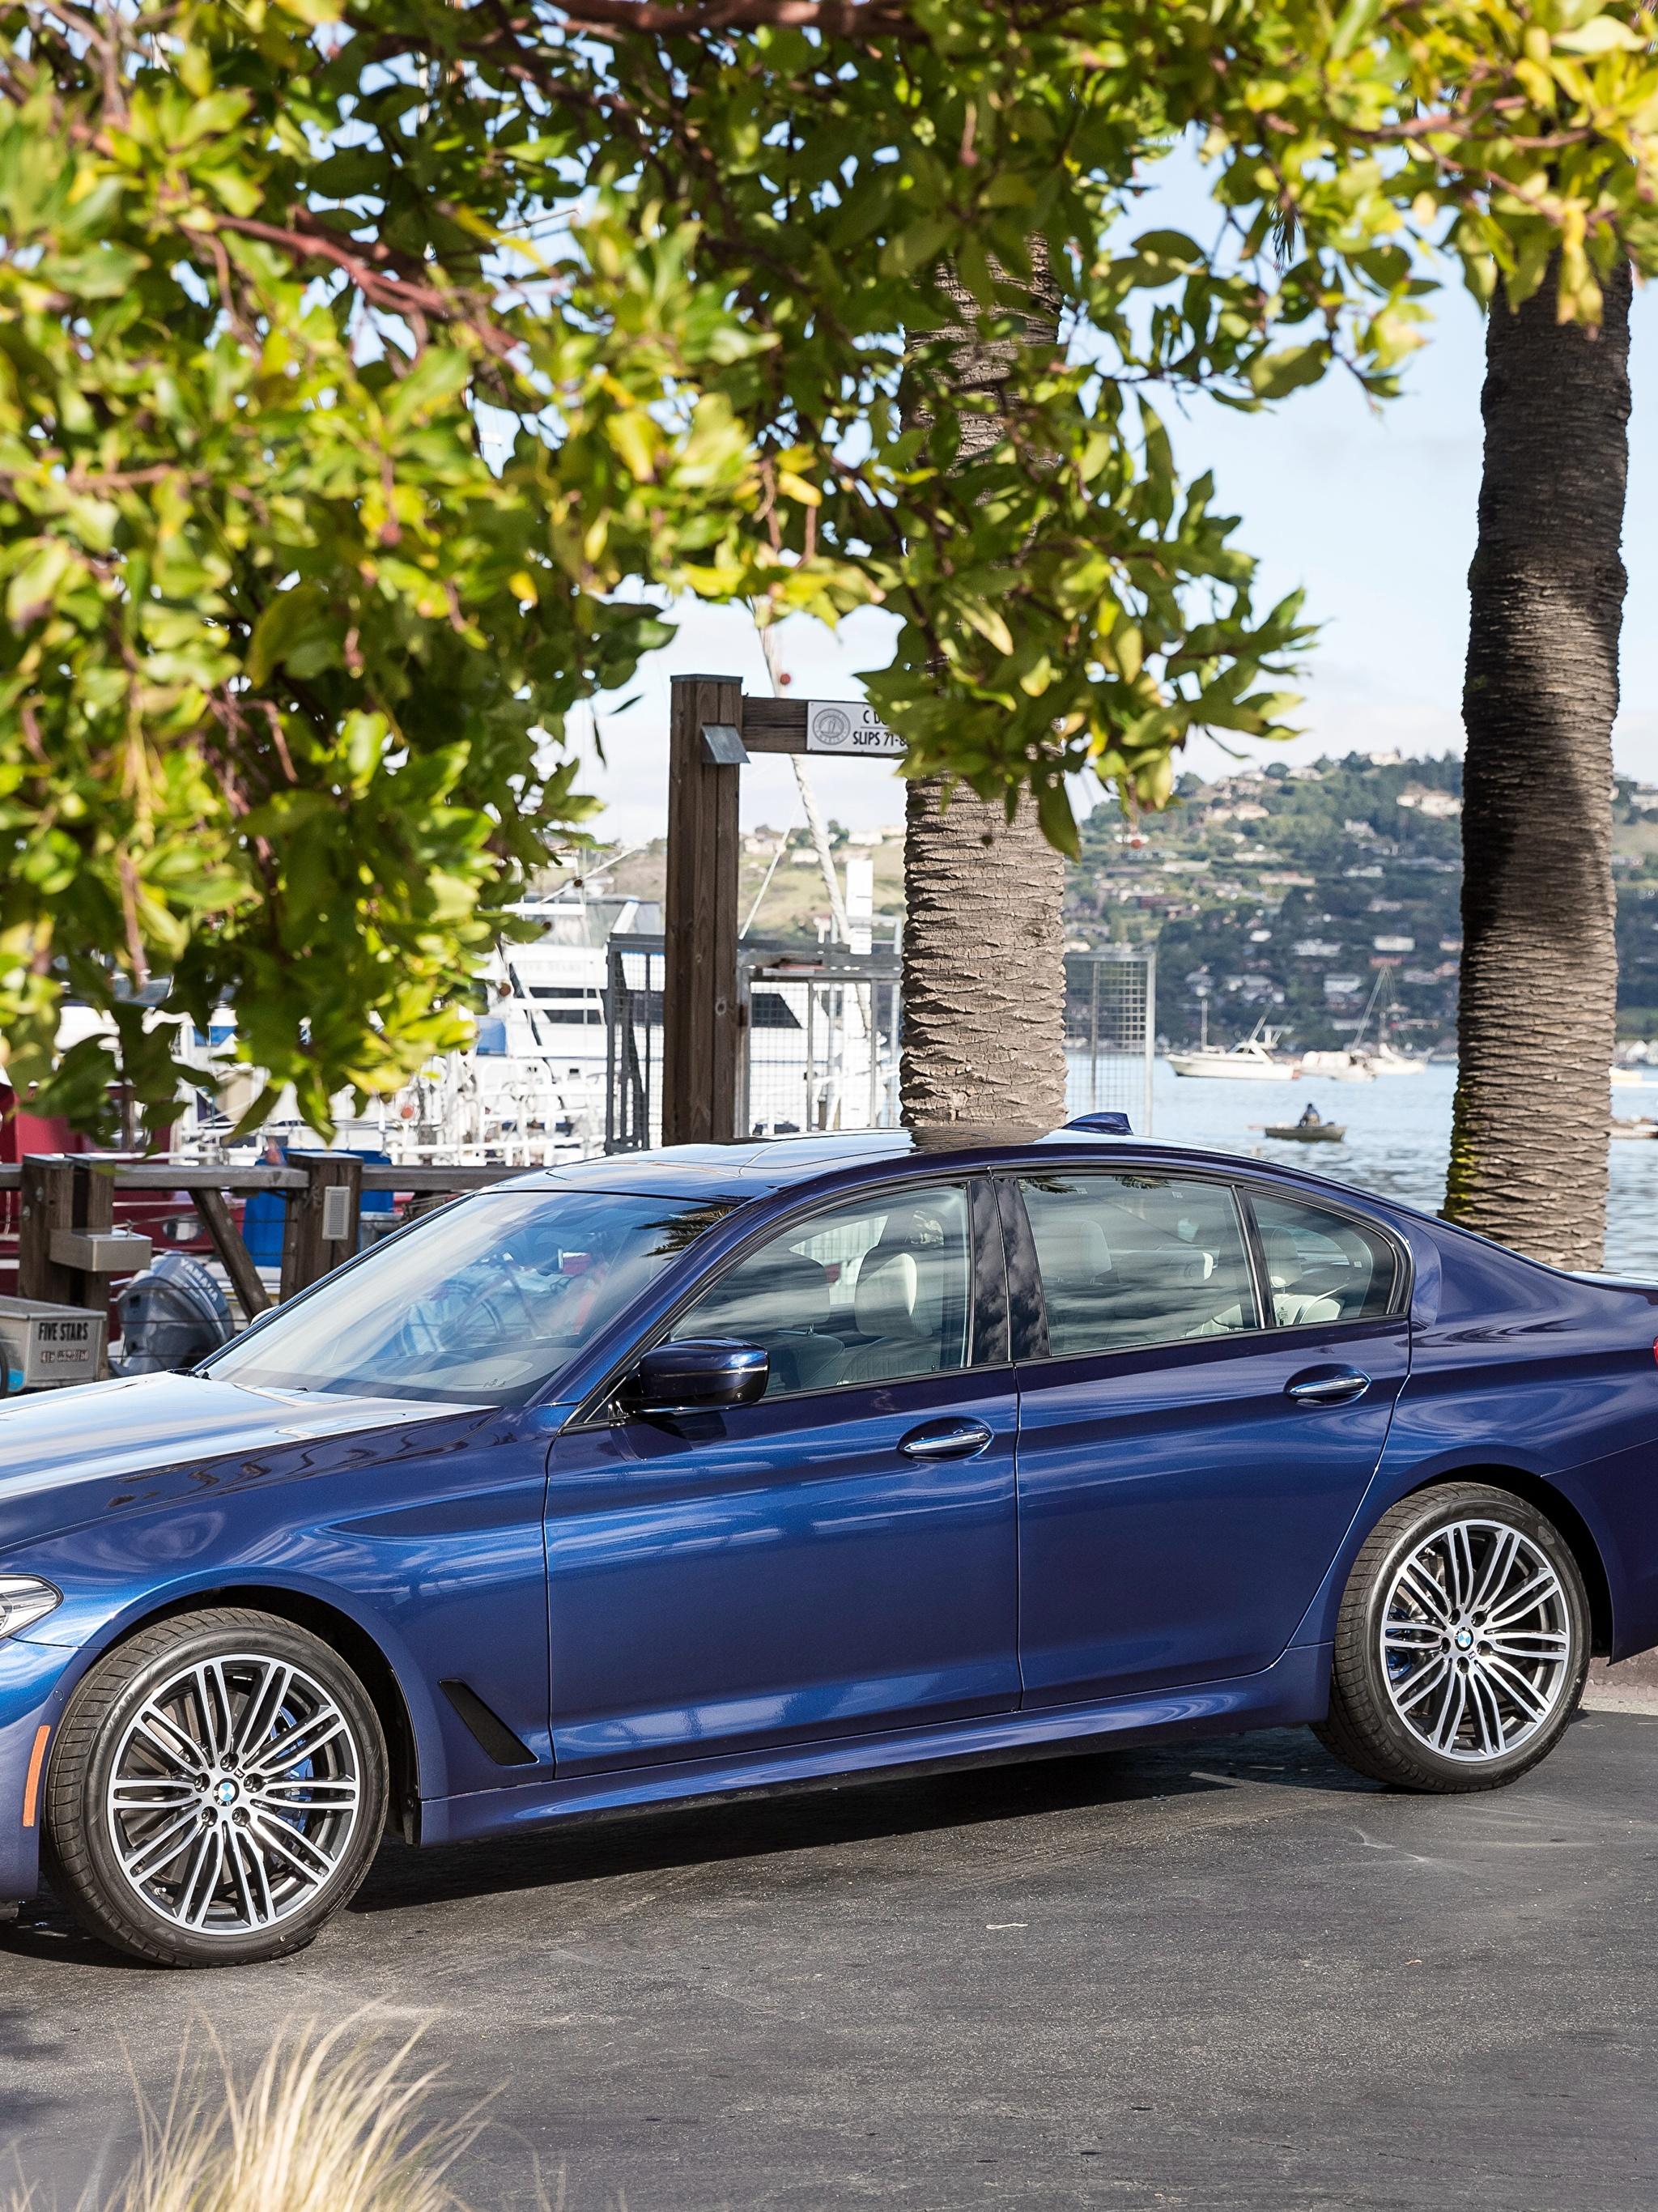 Фото BMW 2018 540i Sedan M Sport Синий Металлик Автомобили 2048x2732 БМВ синих синие синяя Авто Машины